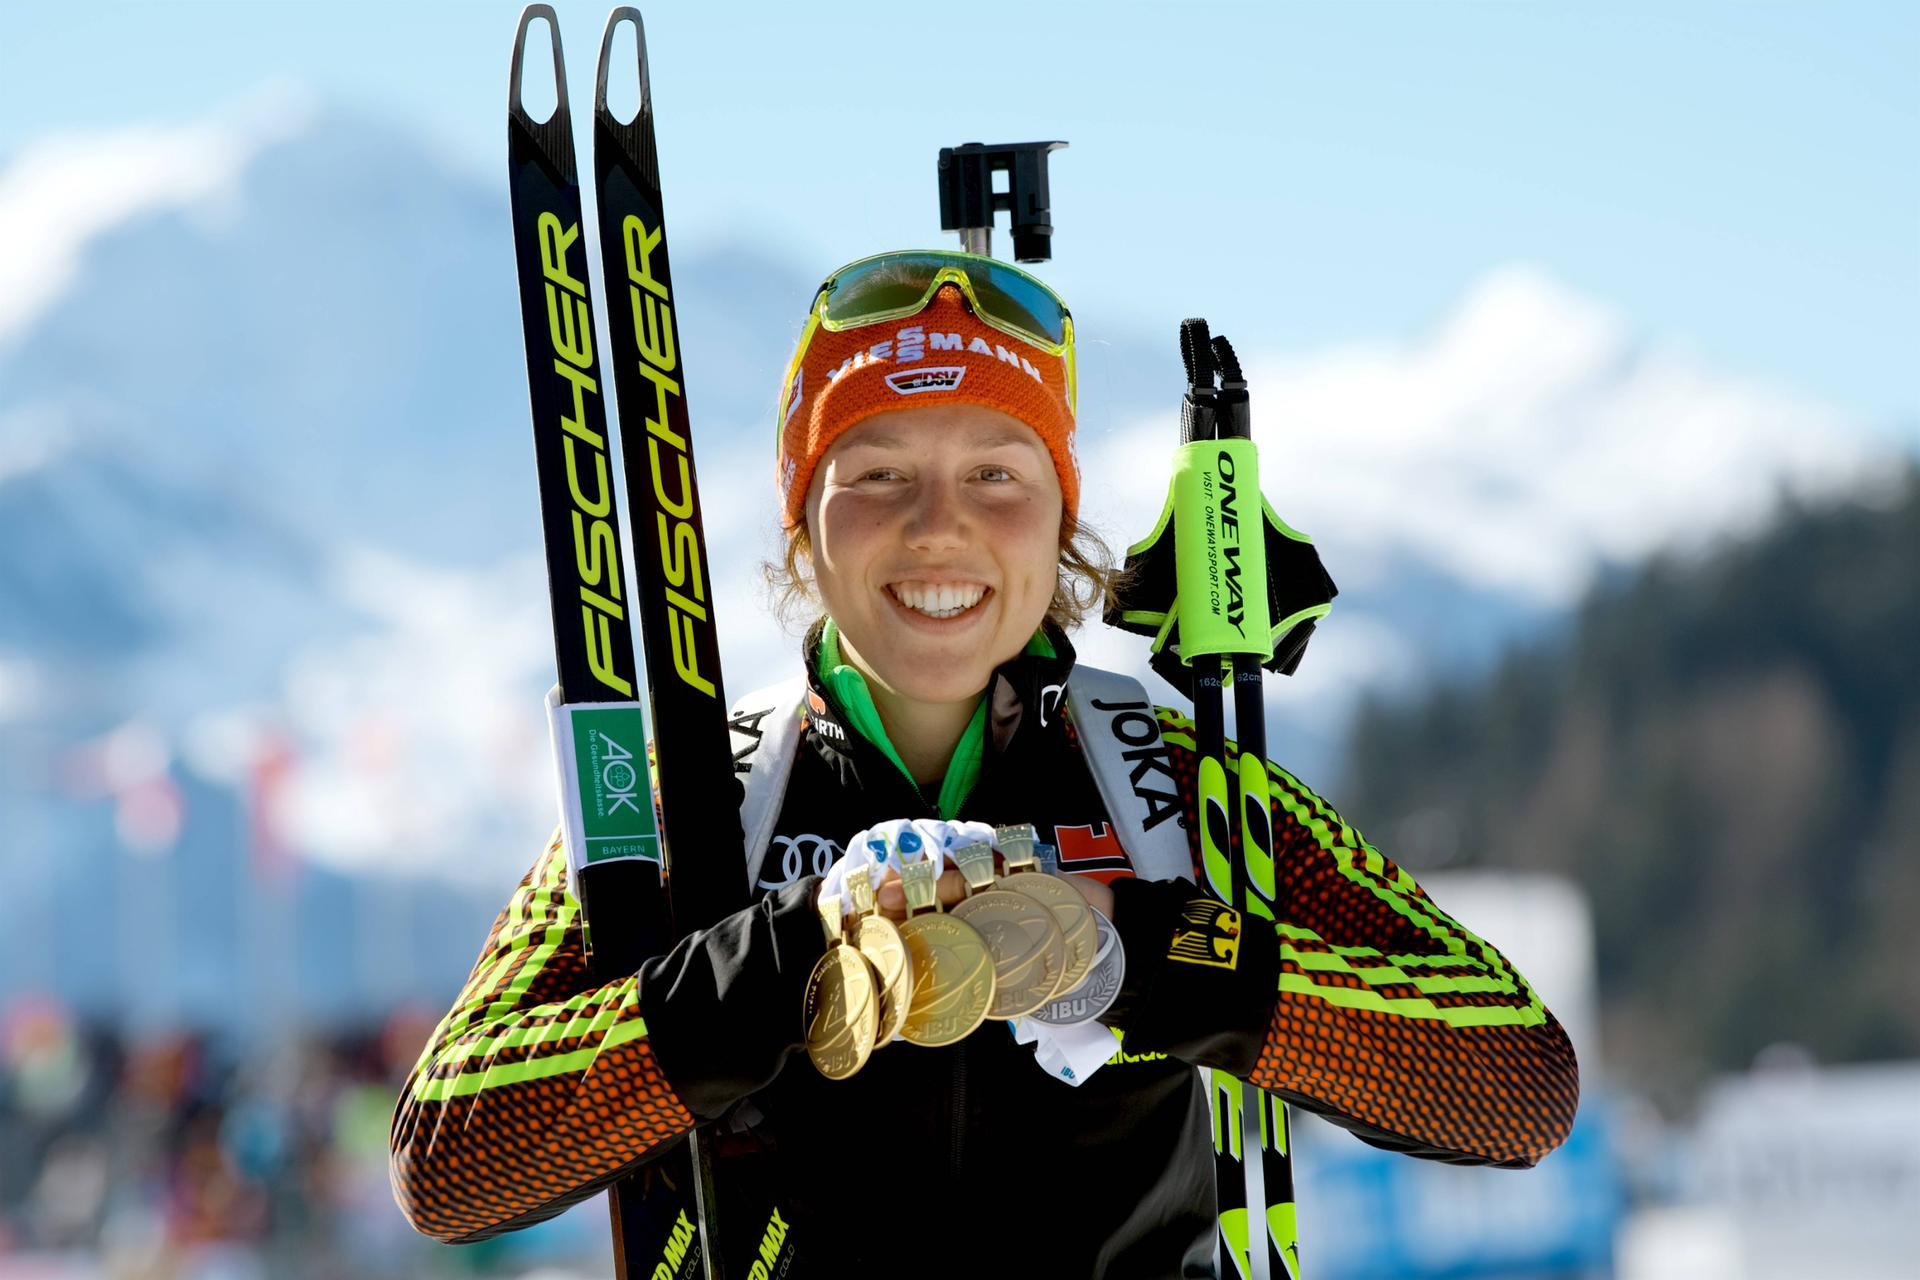 Biathlon: a selection of sites